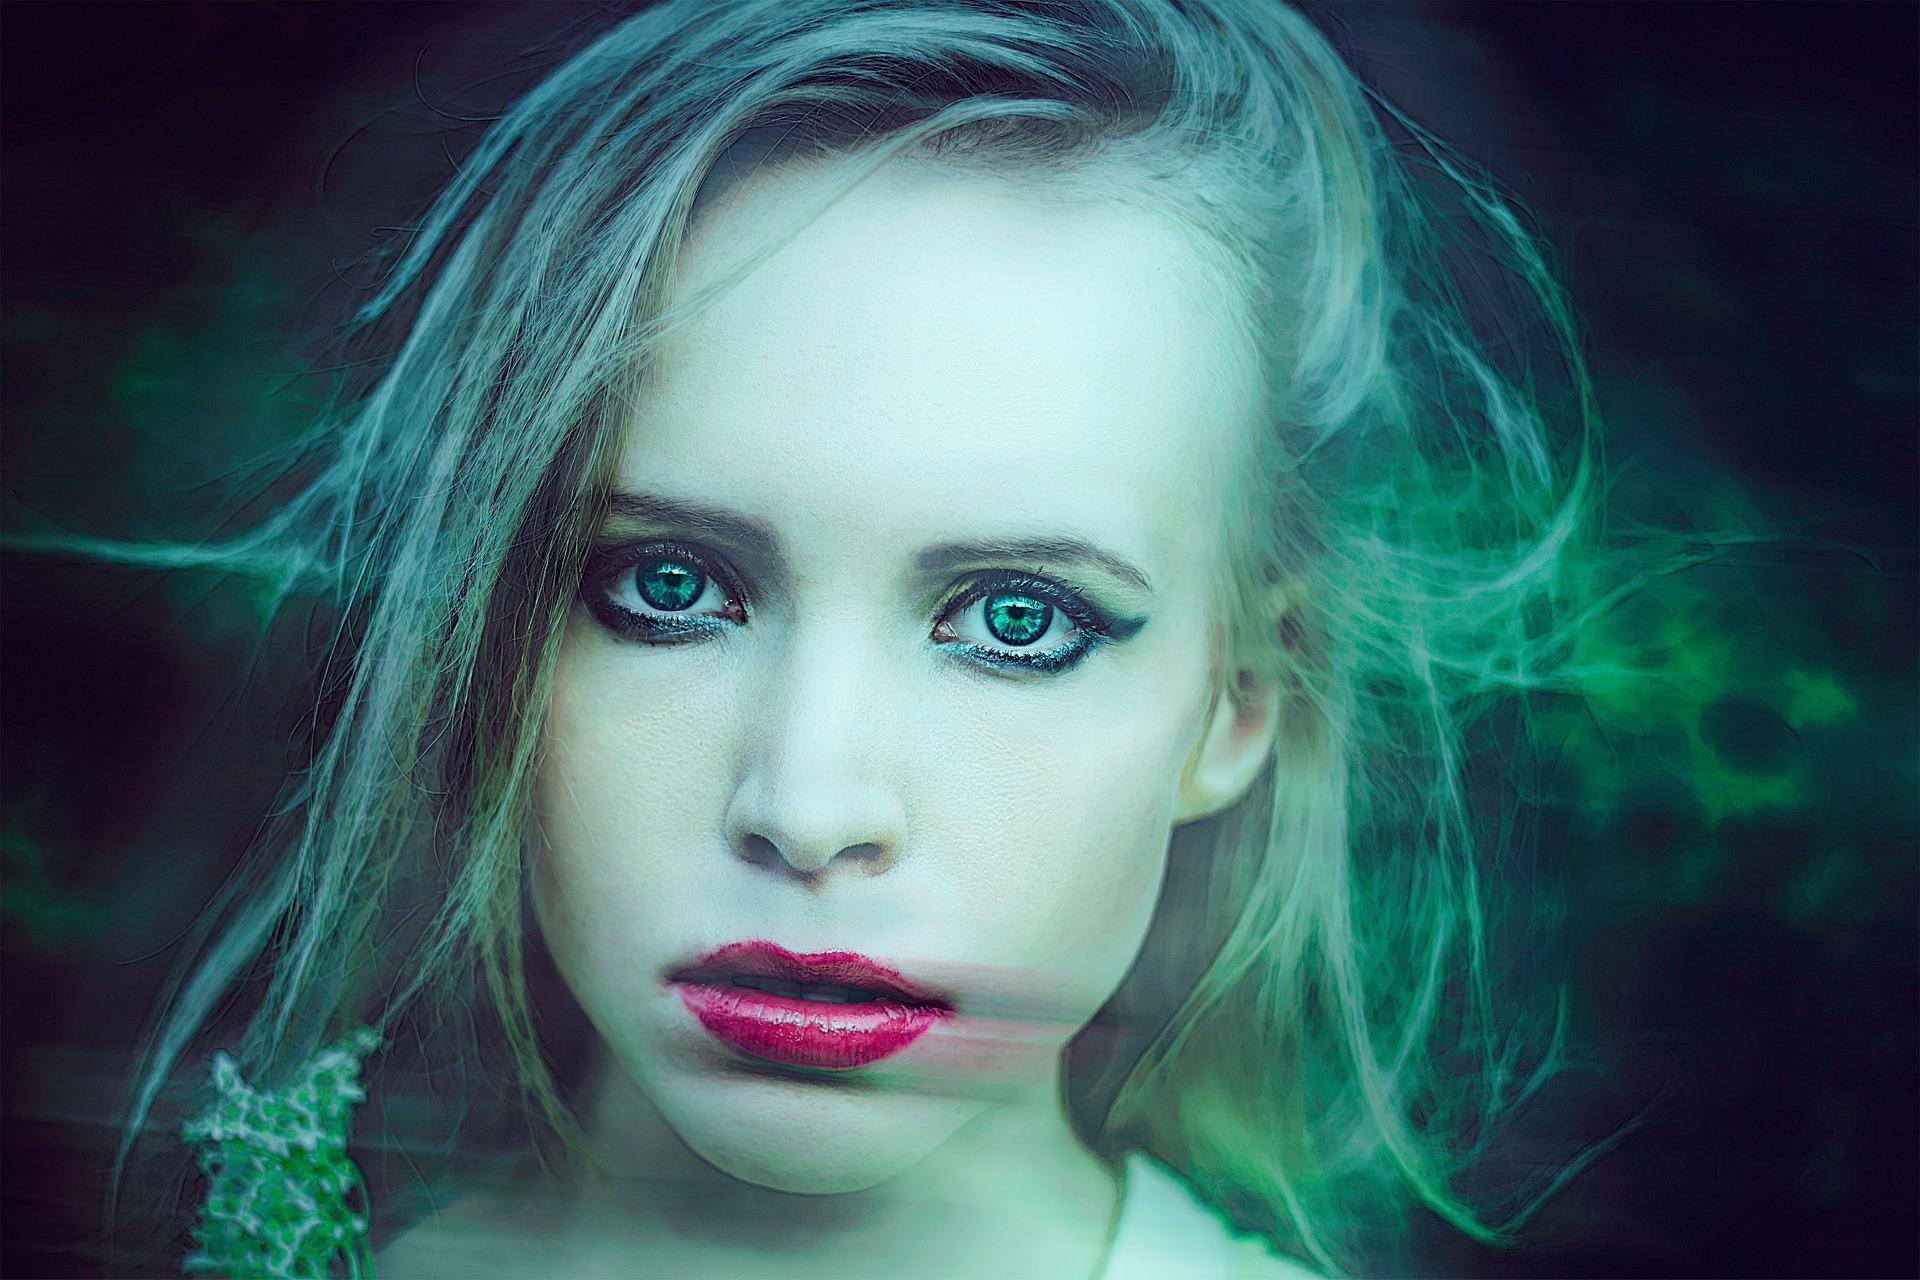 mystical-portrait-of-a-girl